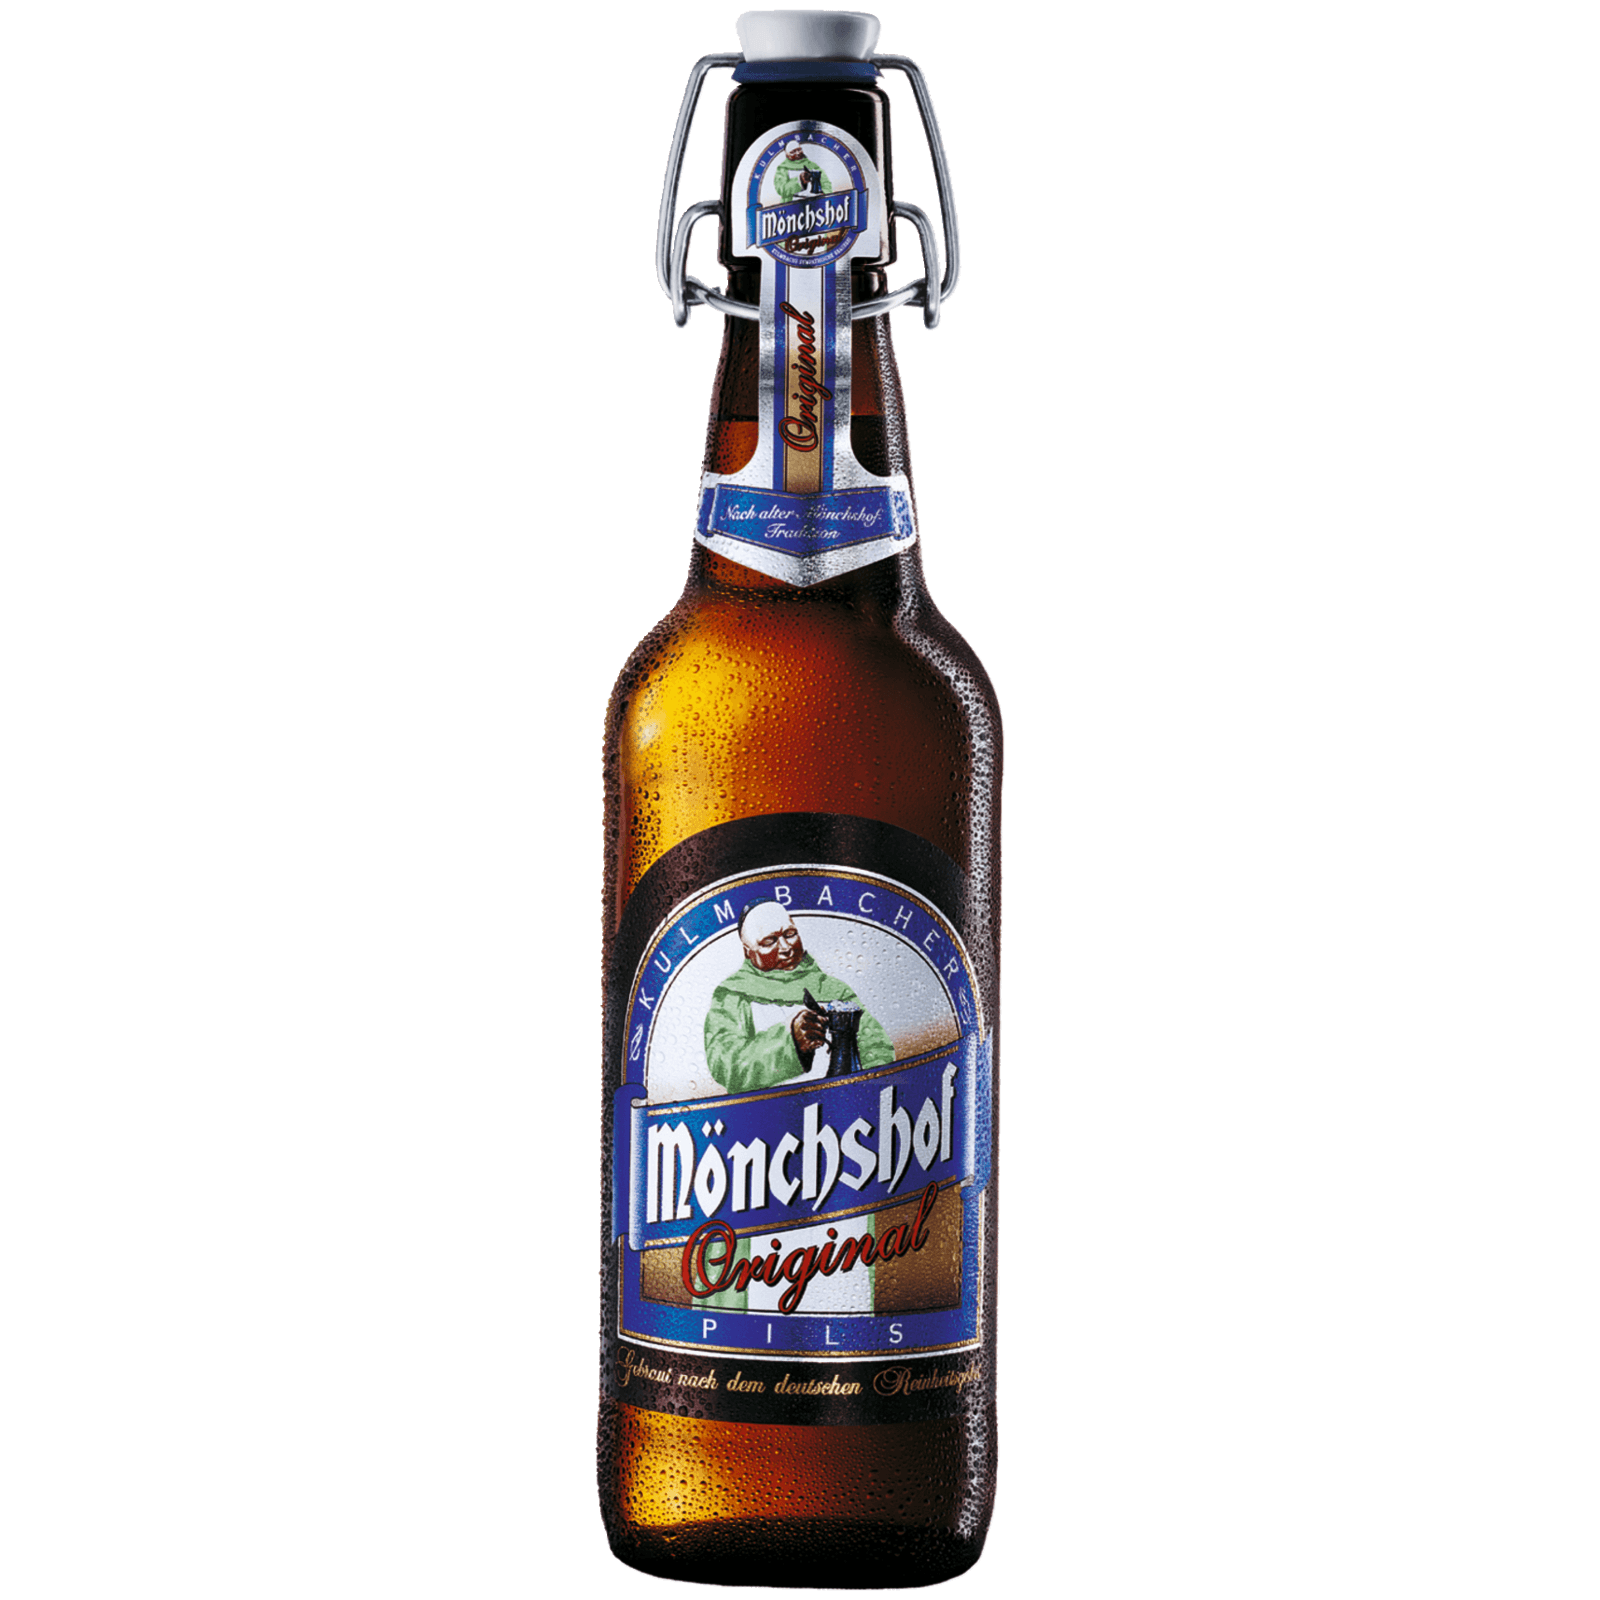 Mönchshof Original 0,5l